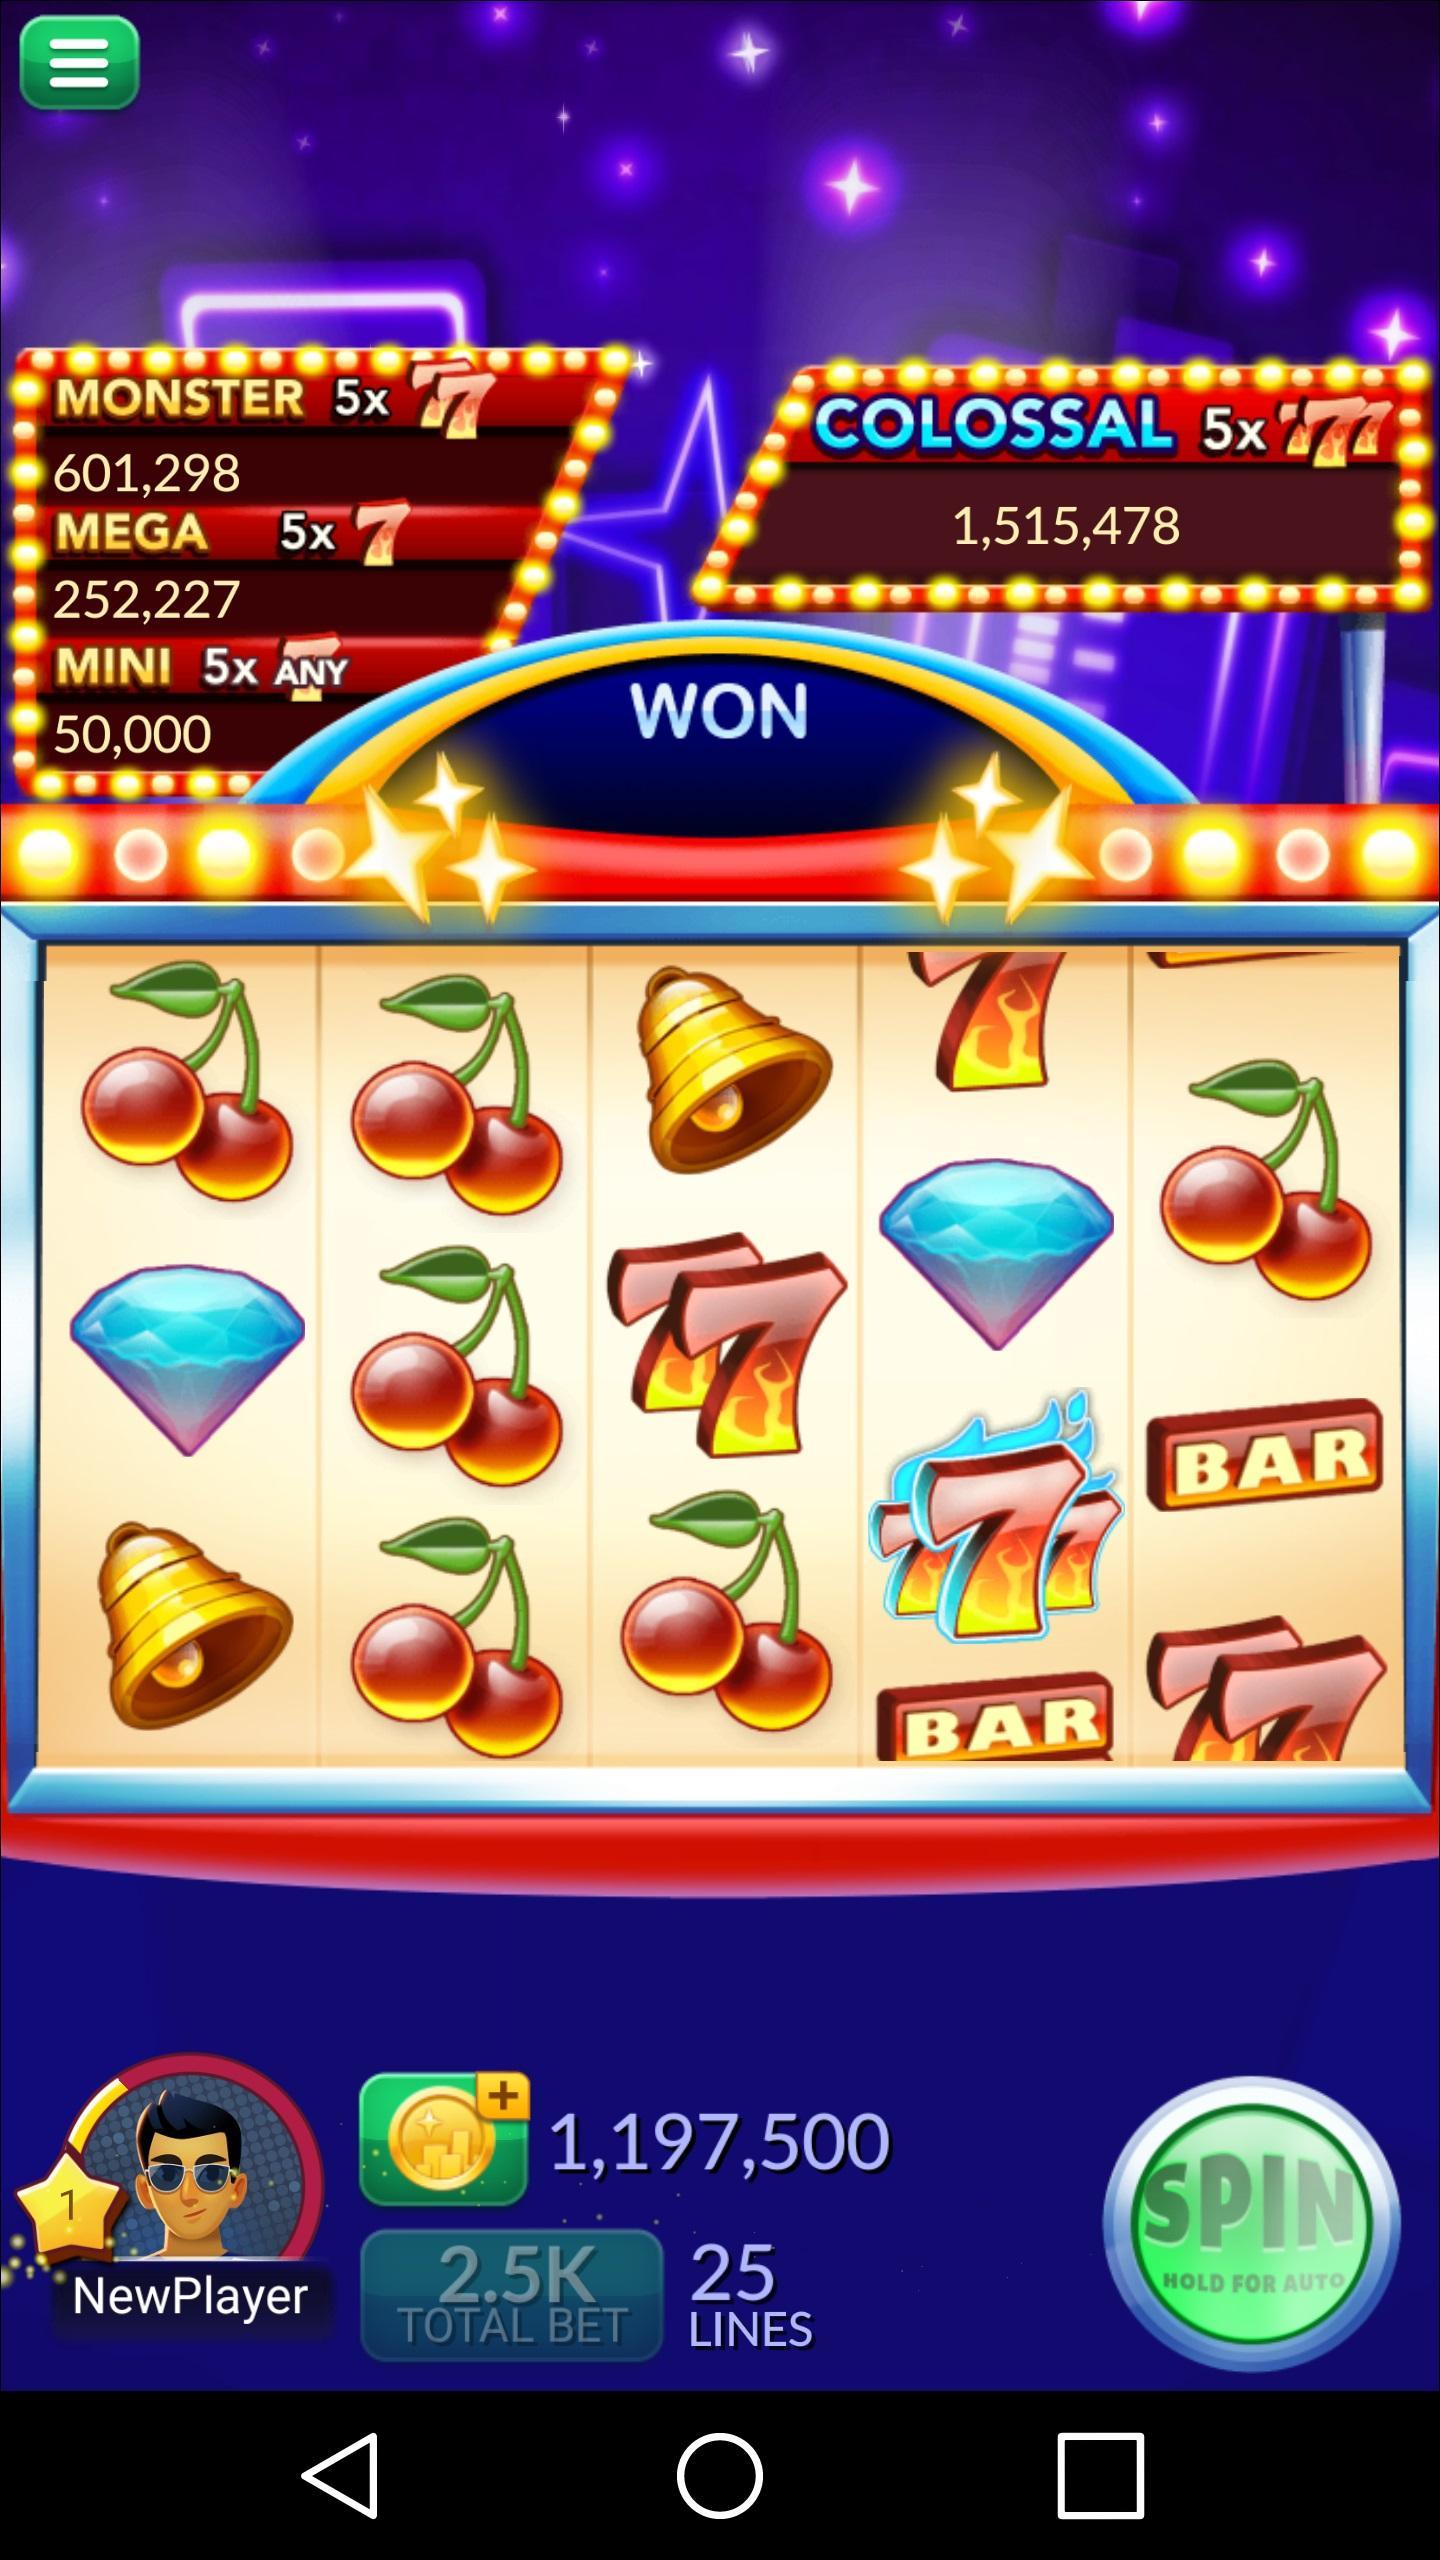 Bingo Slot Games